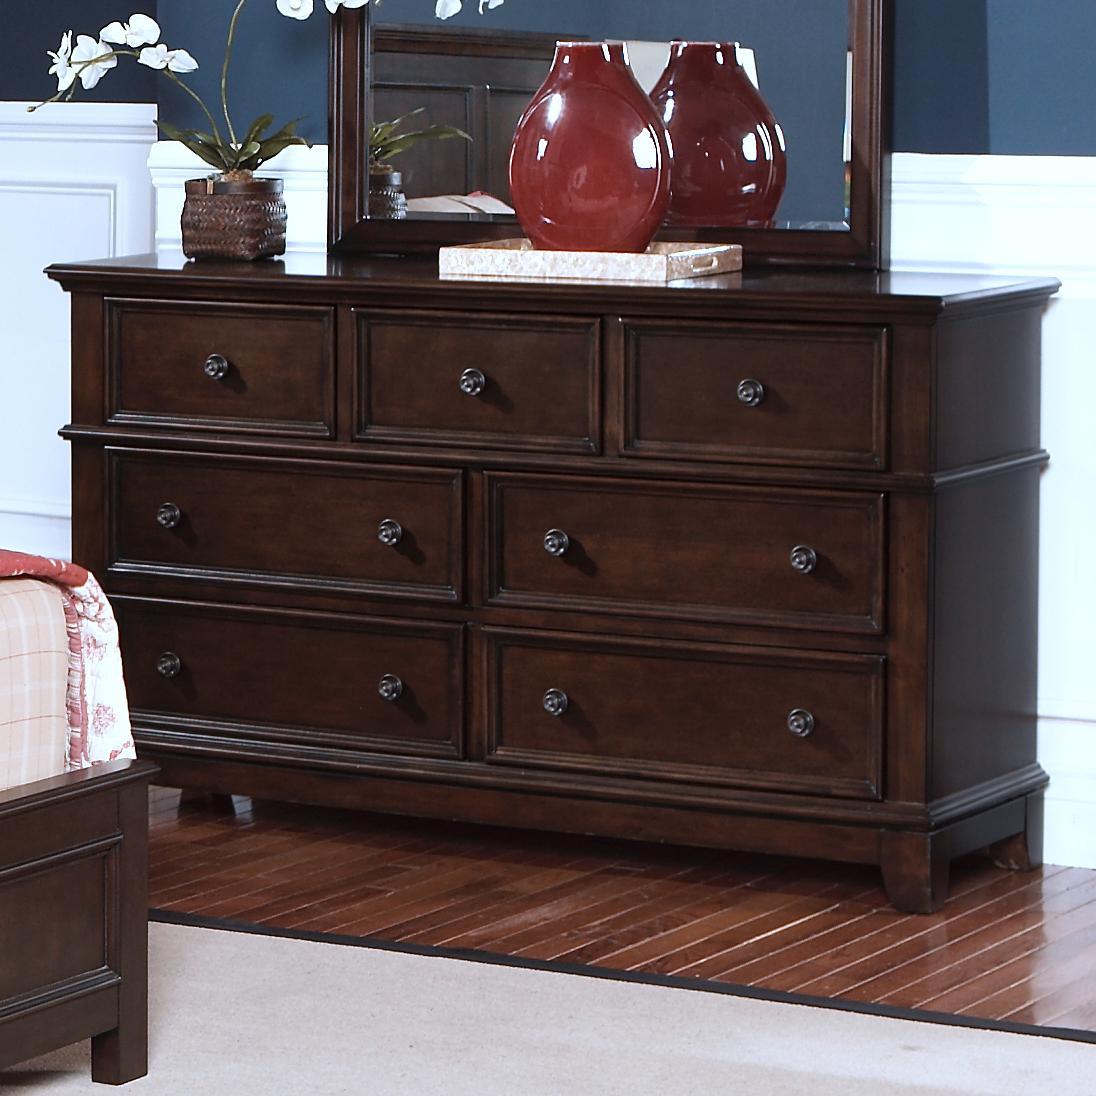 New Classic Prescott Dresser - Item Number: 00-181-050